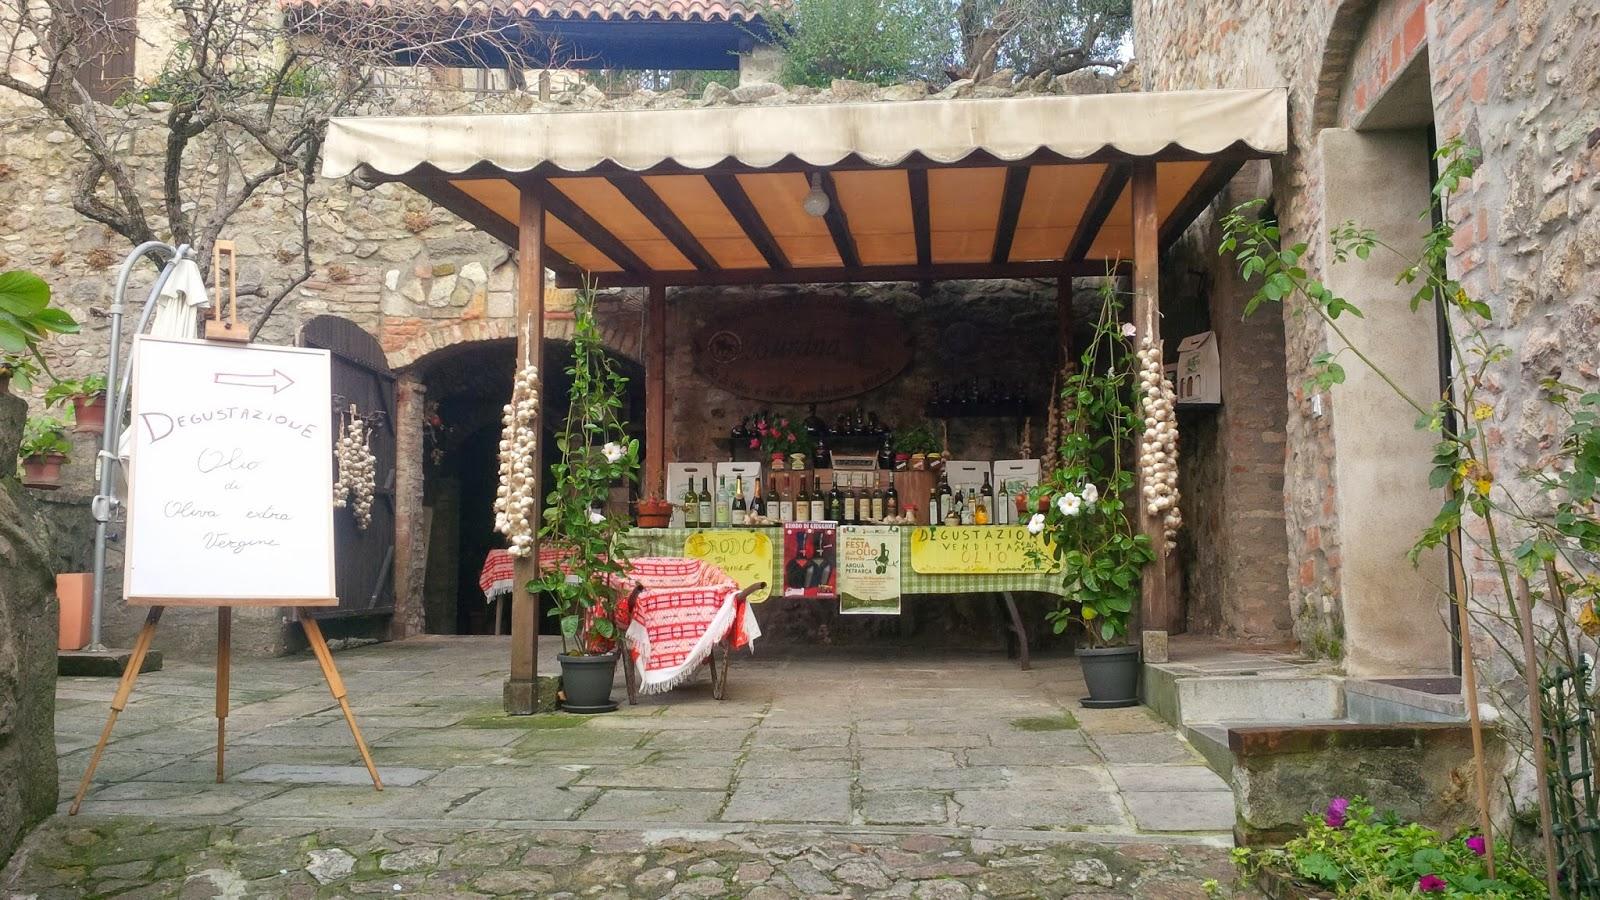 Oil tasting stall in Arqua Petrarca